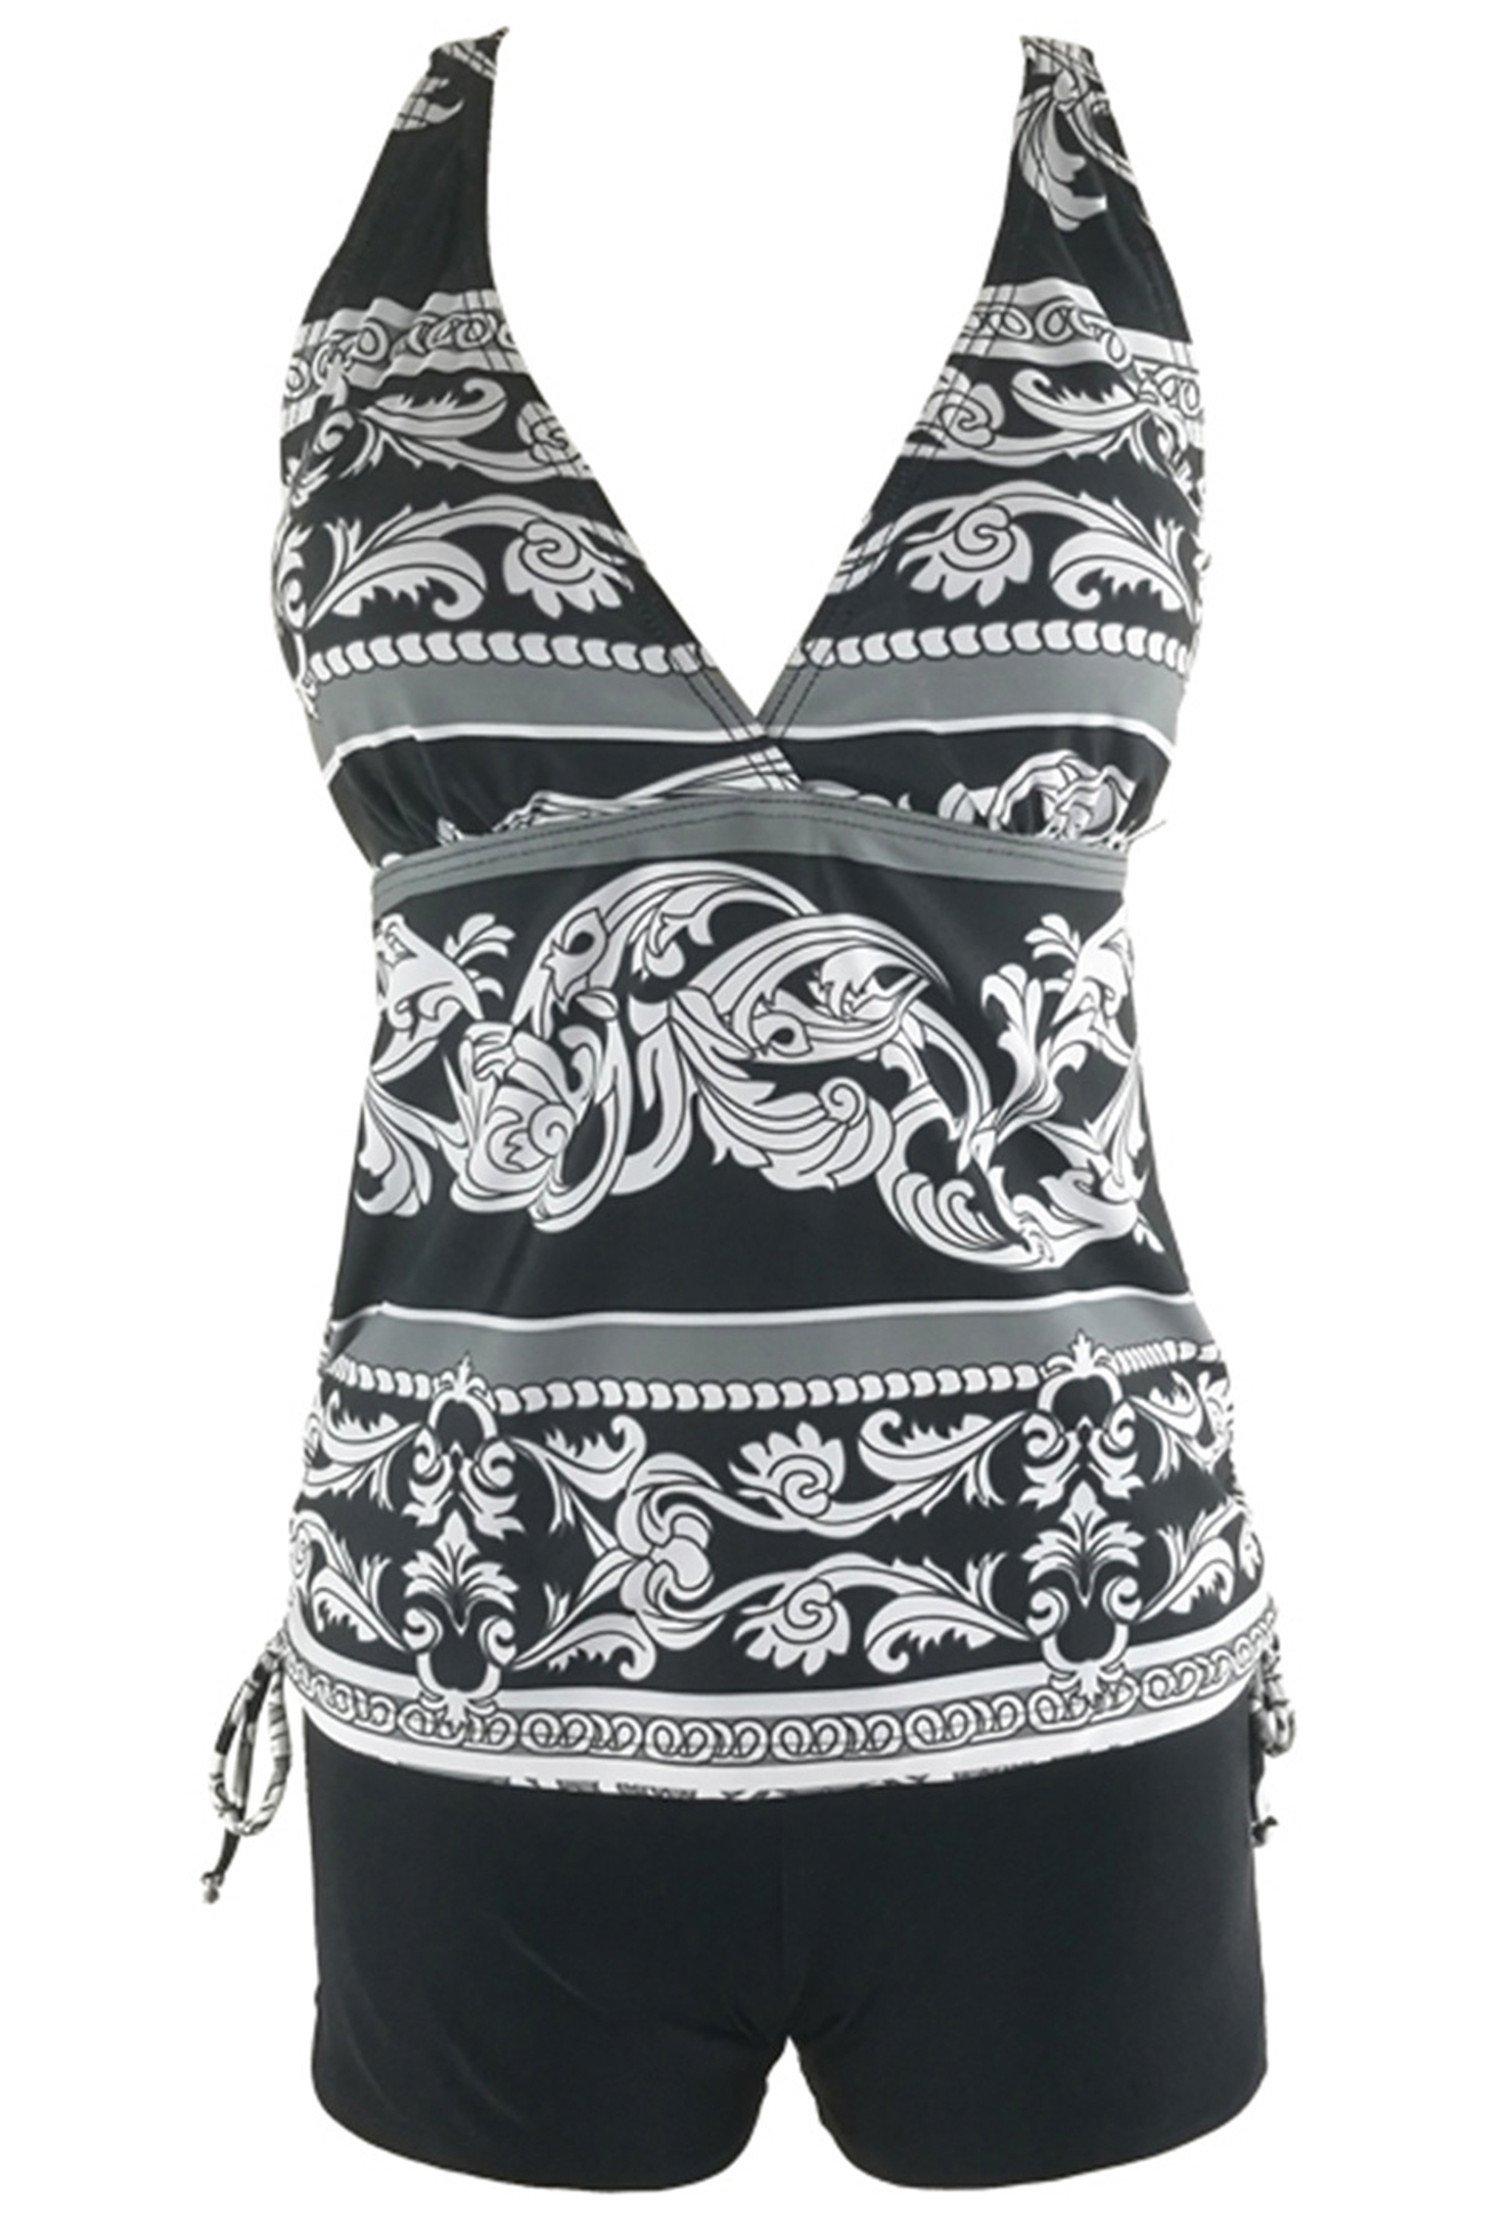 Urban Virgin Womens 2 Piece Bikini Spaghetti Strap Printed Padded Tank Top Tankini Swimsuits For Women,Black Flower,S(US:4-6)